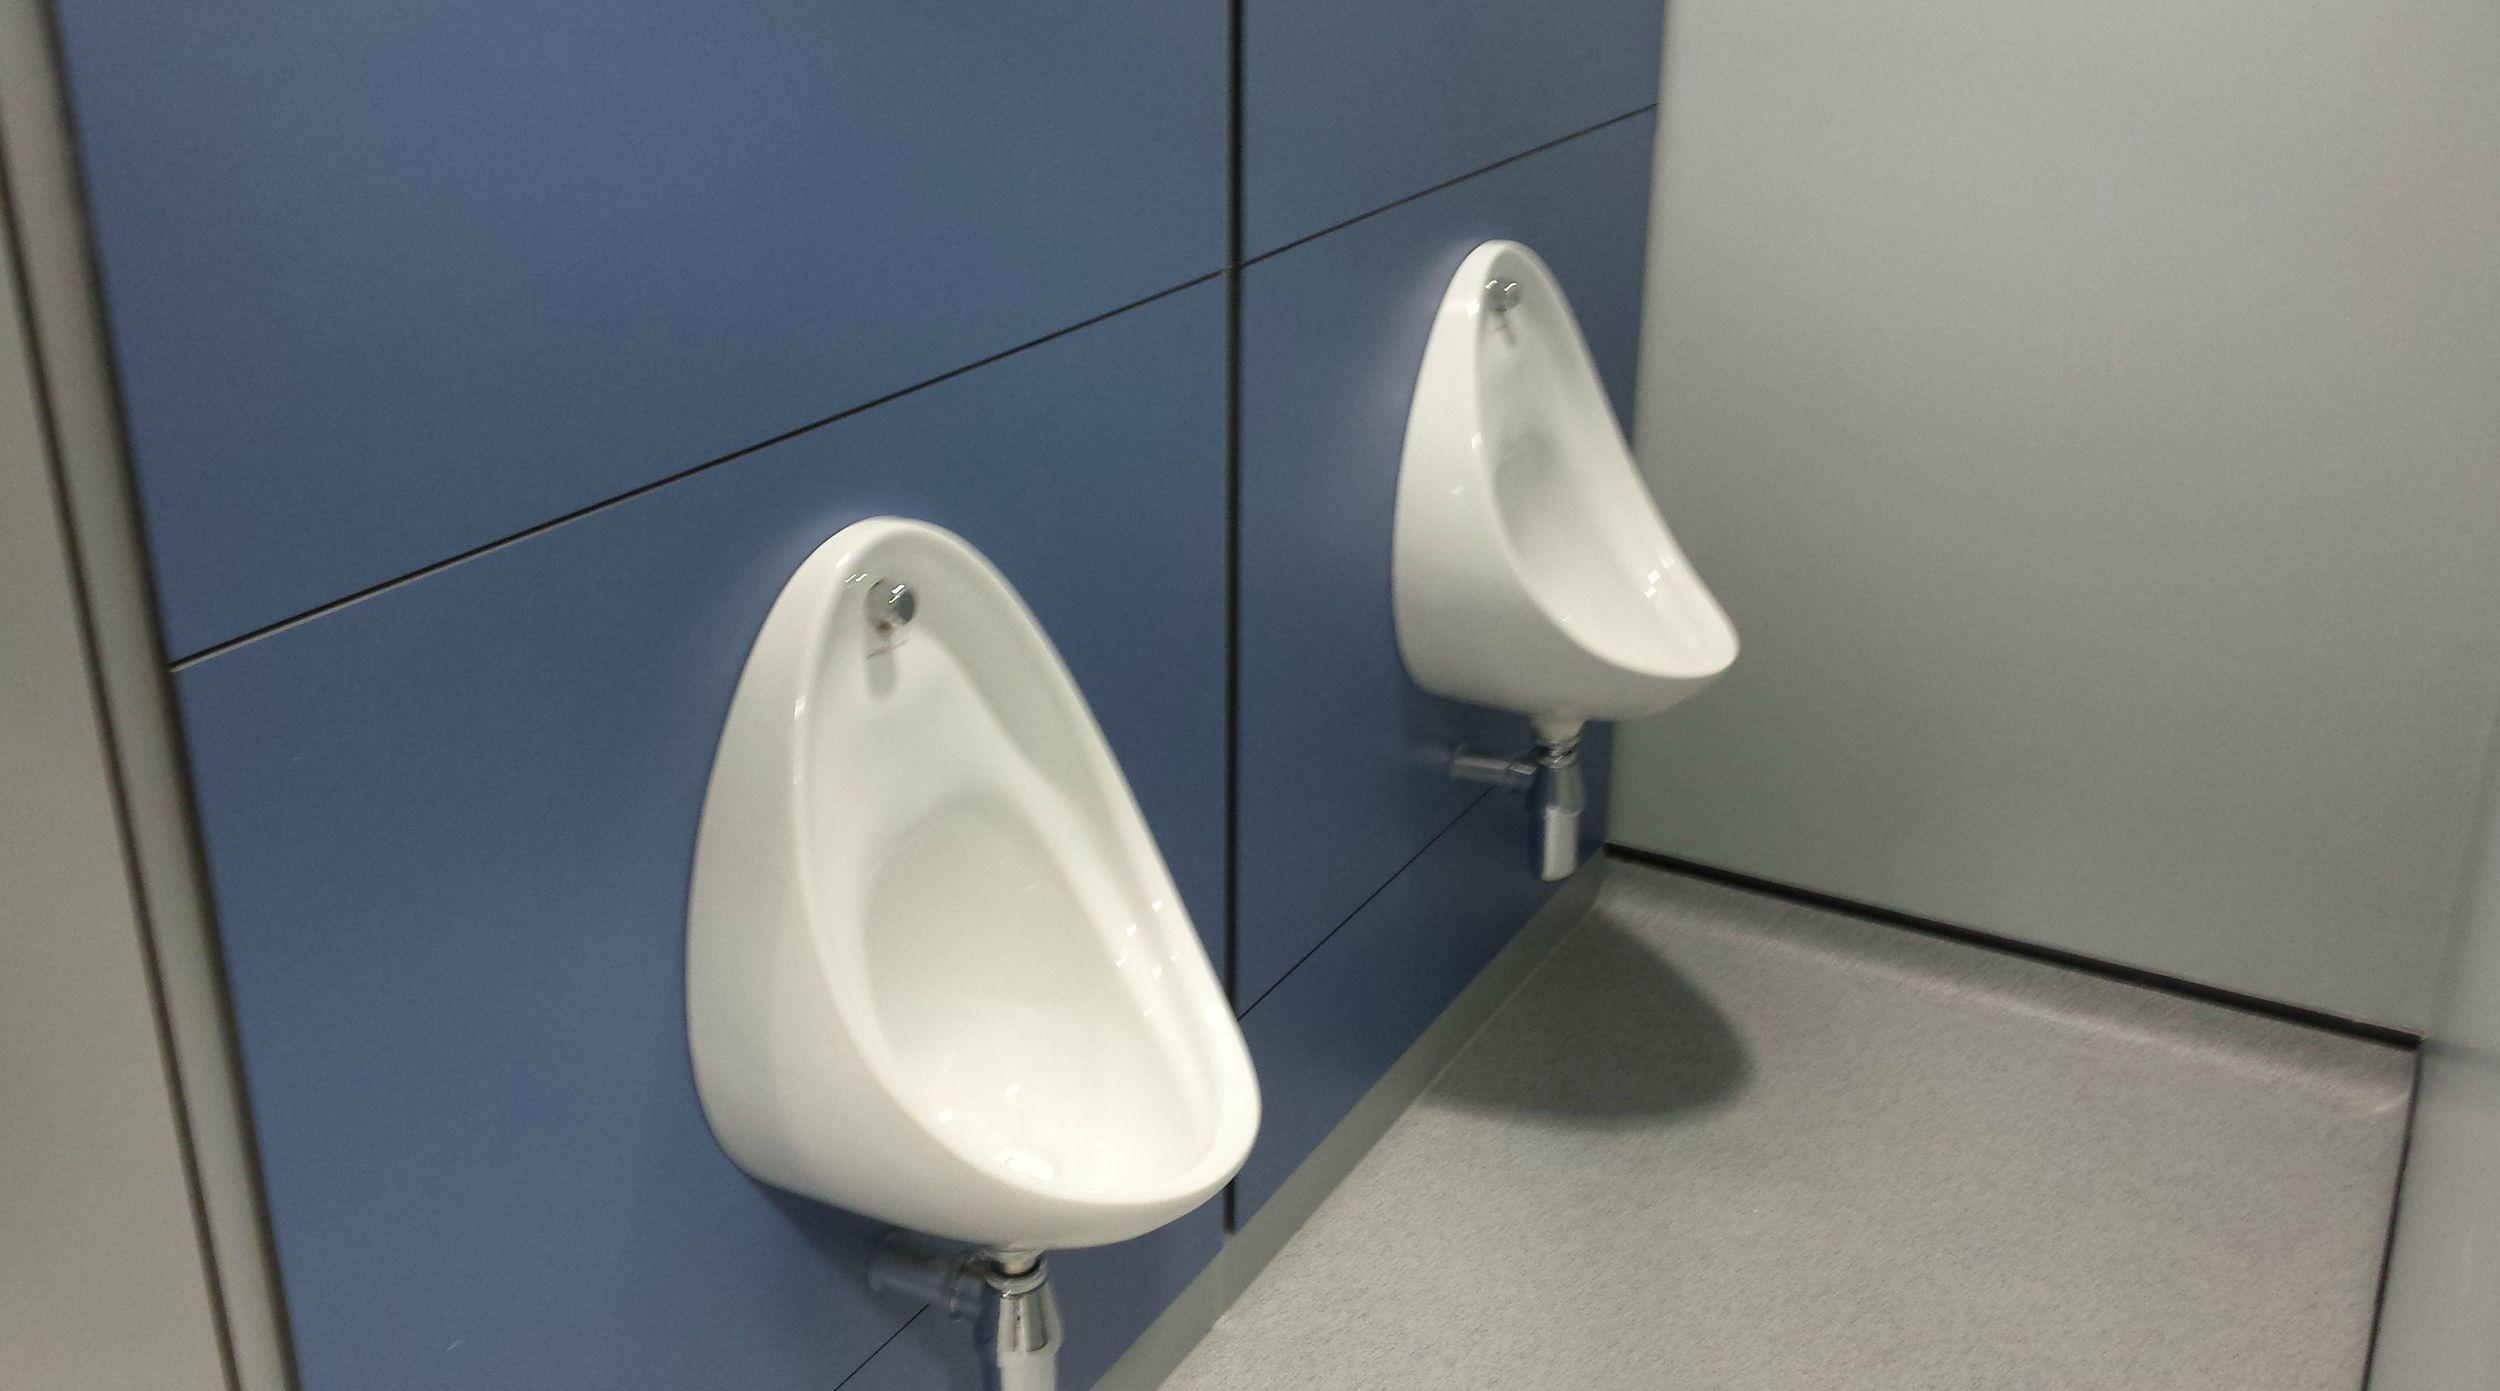 BeFunky_L2 - Urinals.jpg.jpg